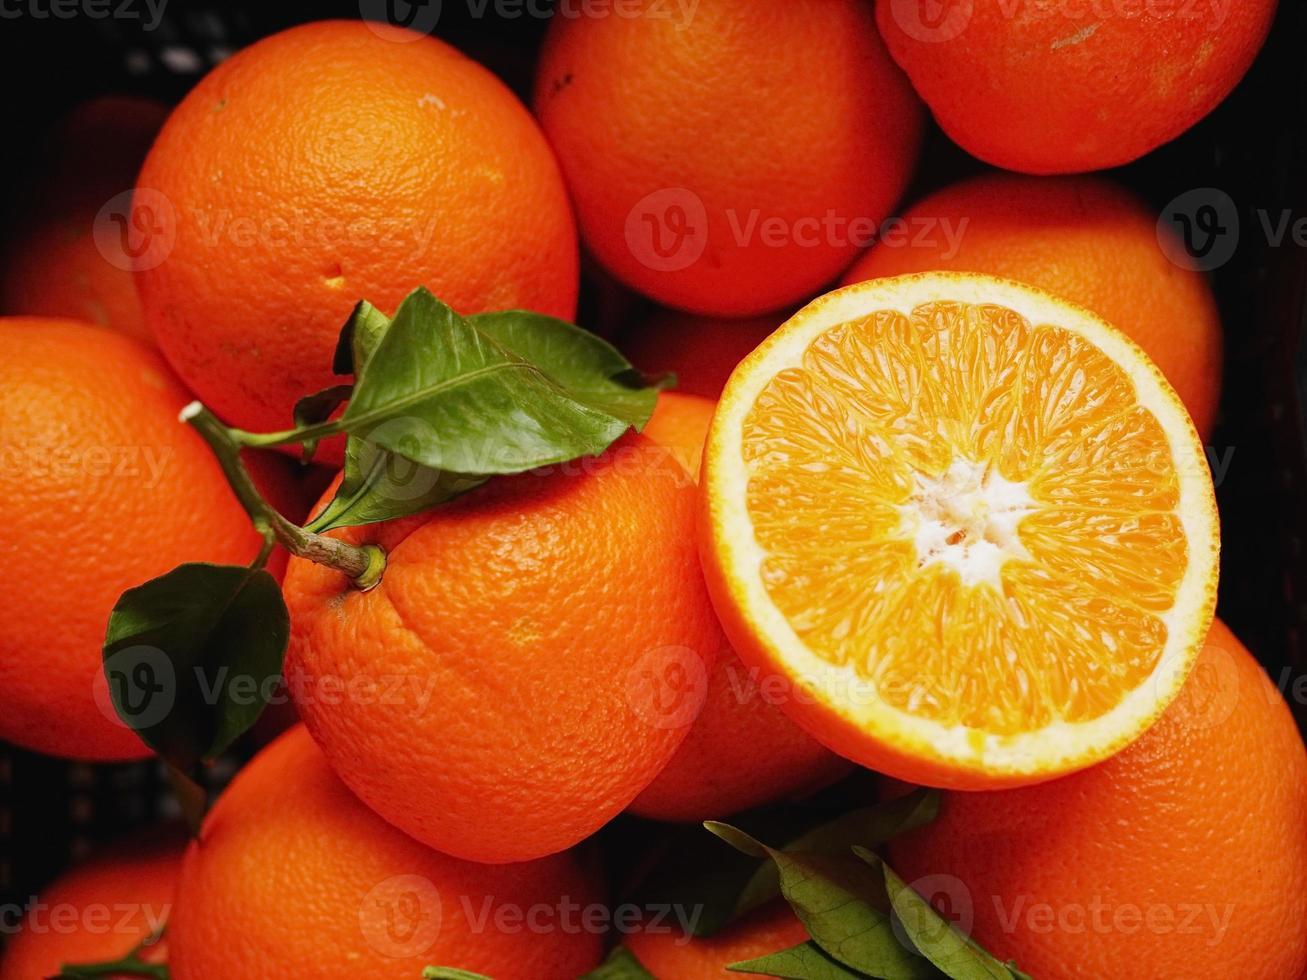 oranges market organic leaf photo